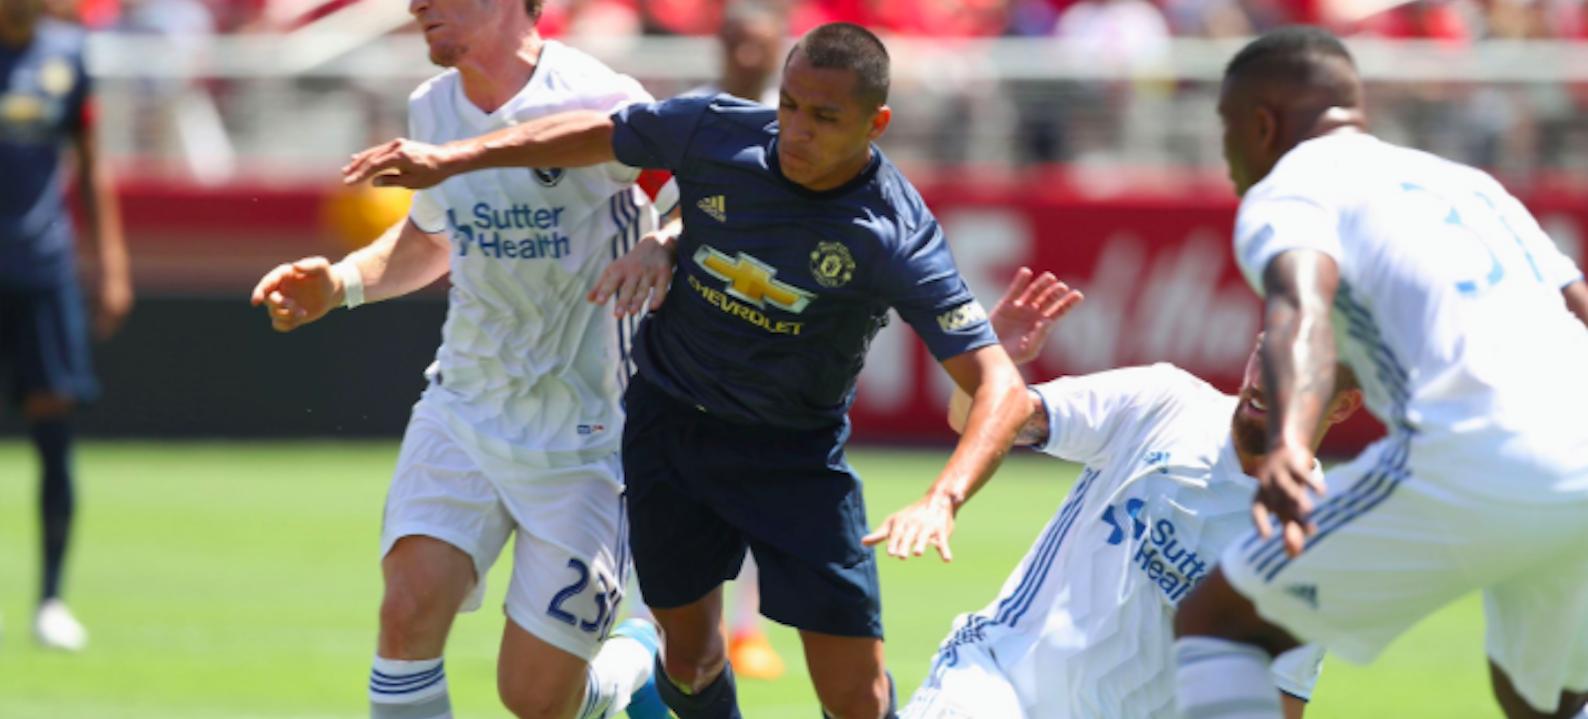 Manchester United fans pleased with Alexis Sanchez's performance vs AC Milan